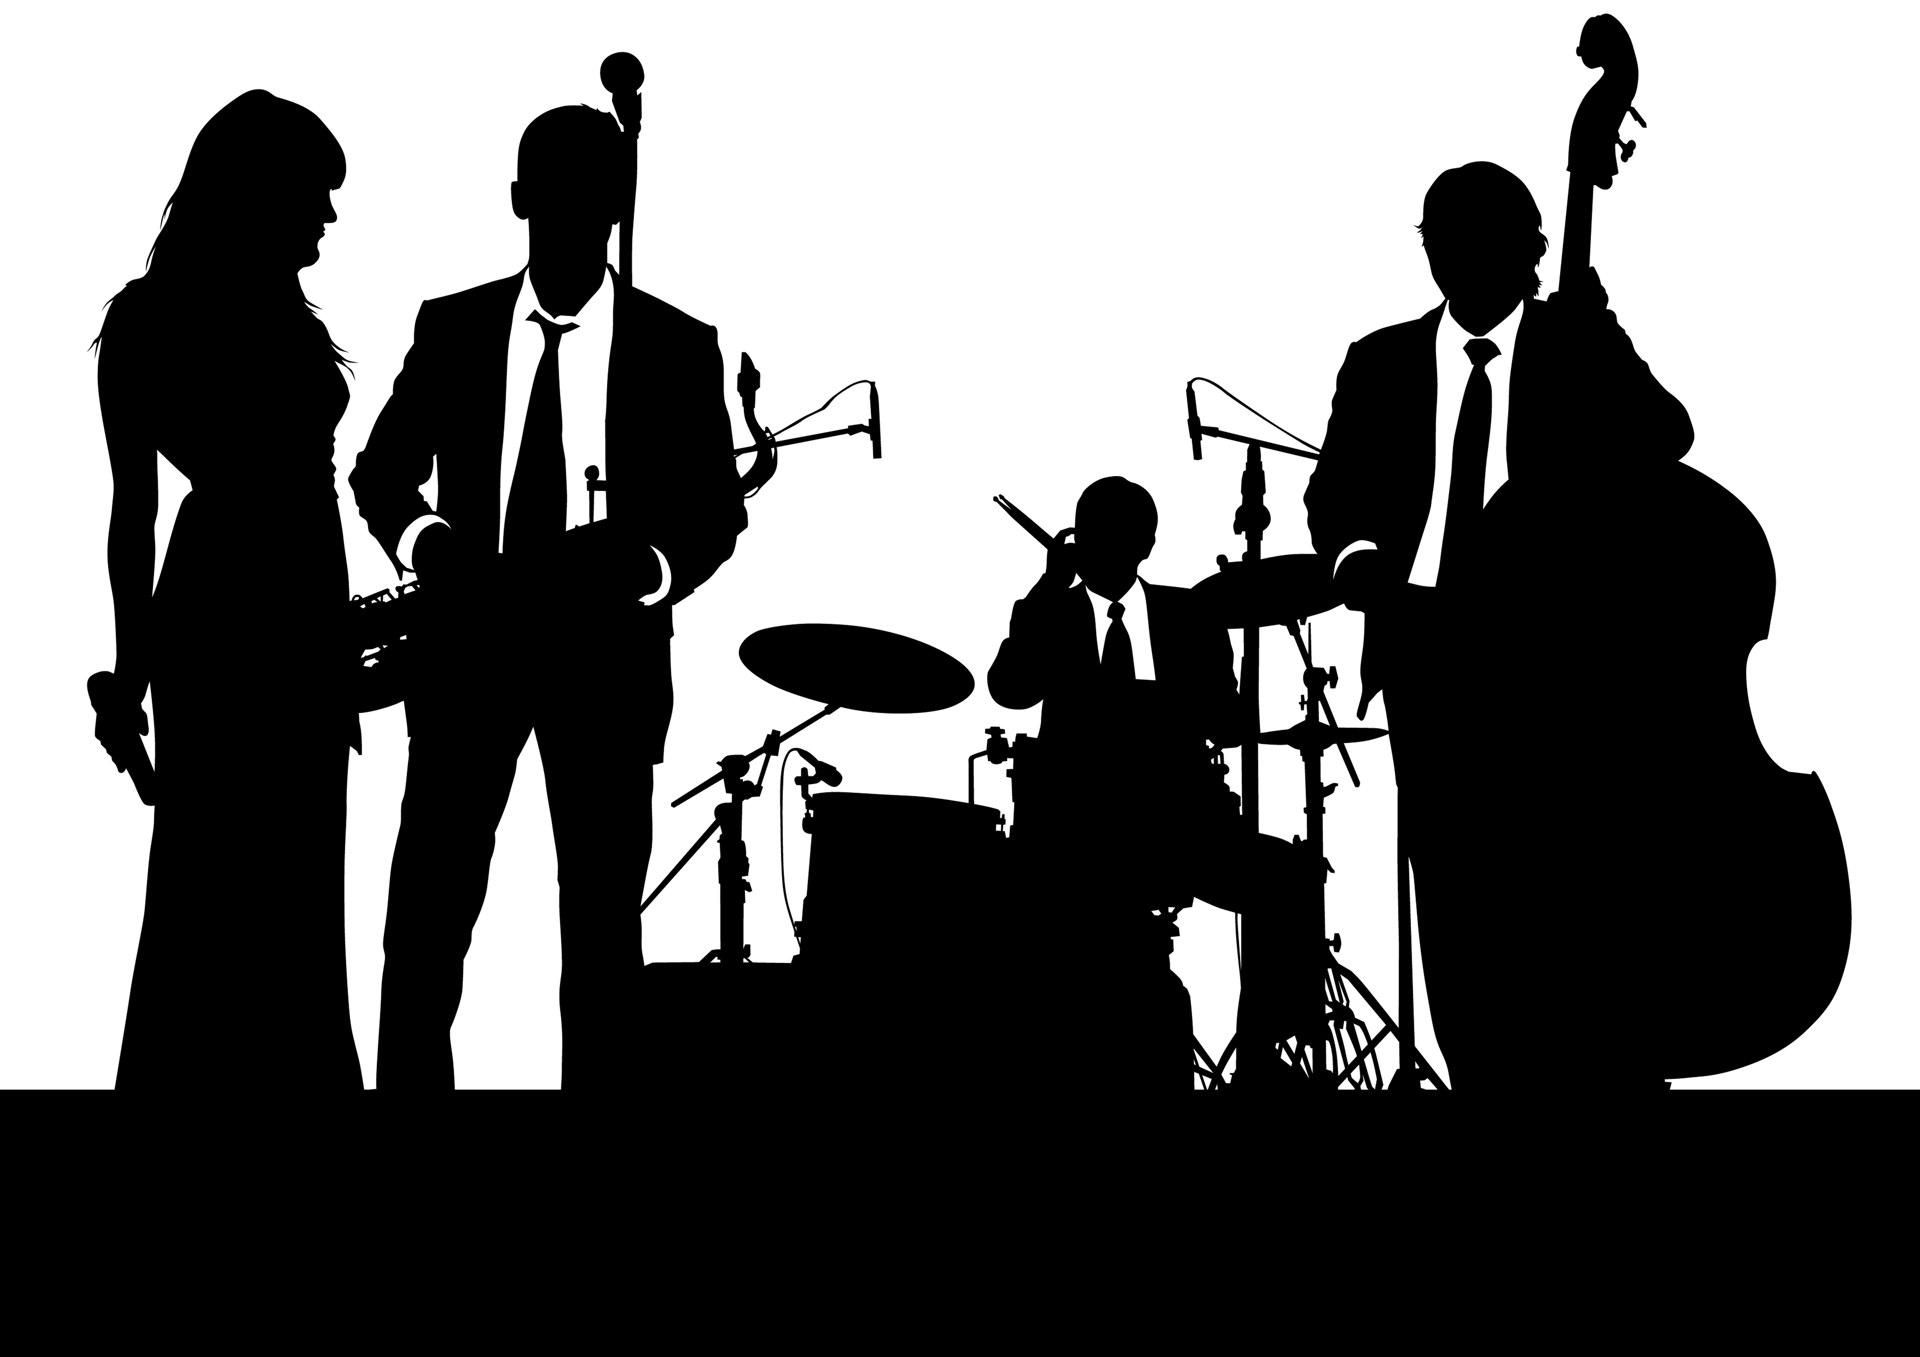 silhouette-group-sm